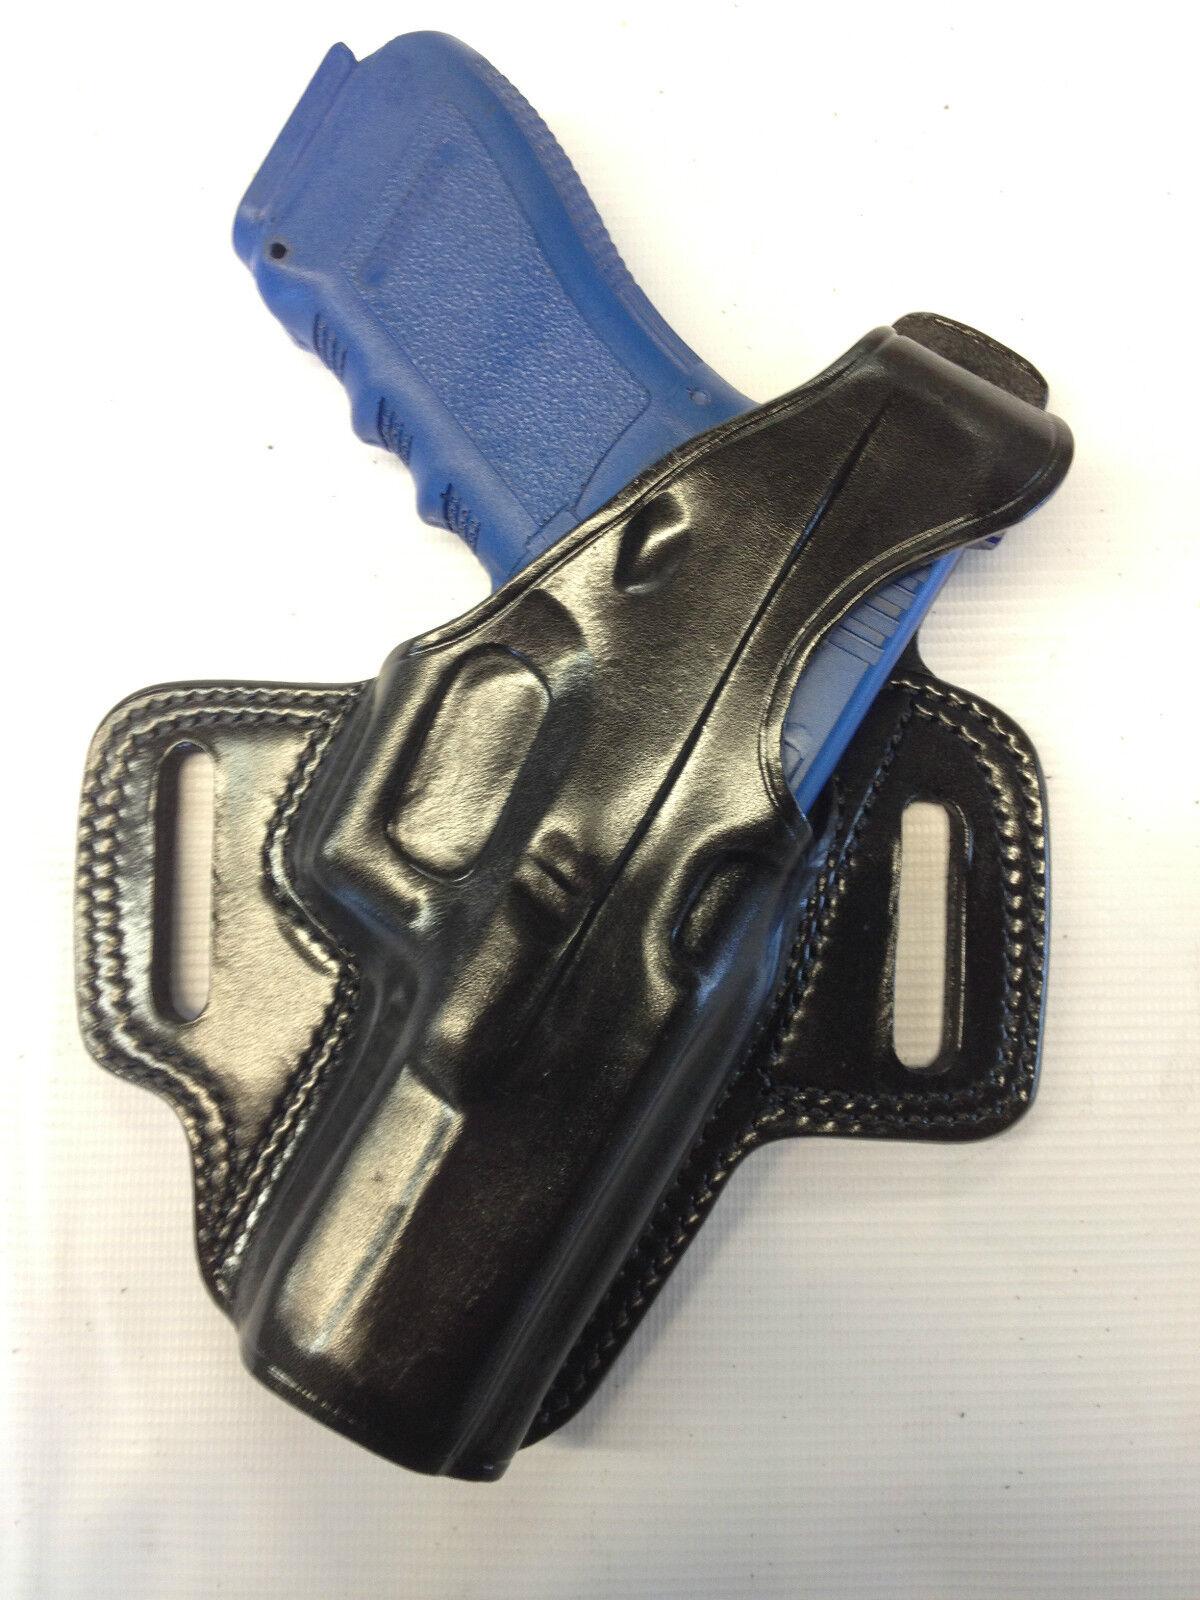 Galco Fletch Funda Para Sig P228, P229, P225 Negro mano izquierda, parte FL251B